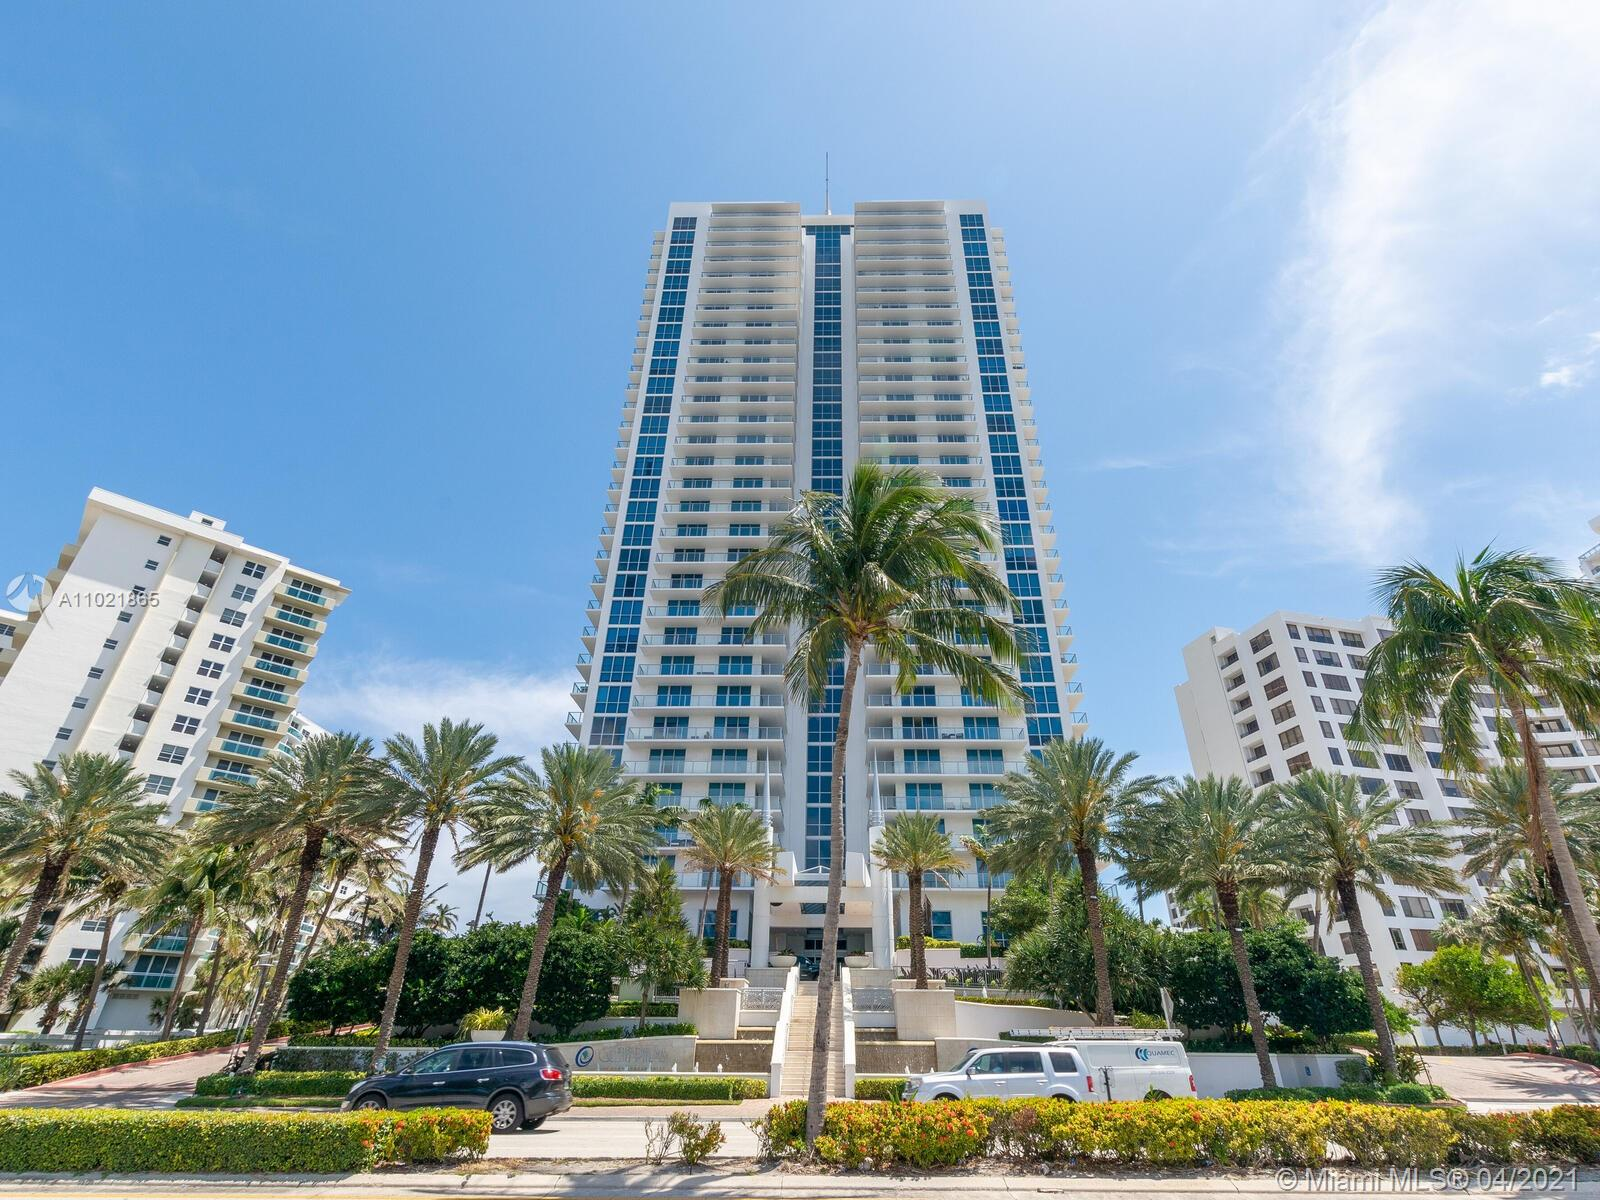 Ocean Palms #1004 - 3101 S Ocean Dr #1004, Hollywood, FL 33019